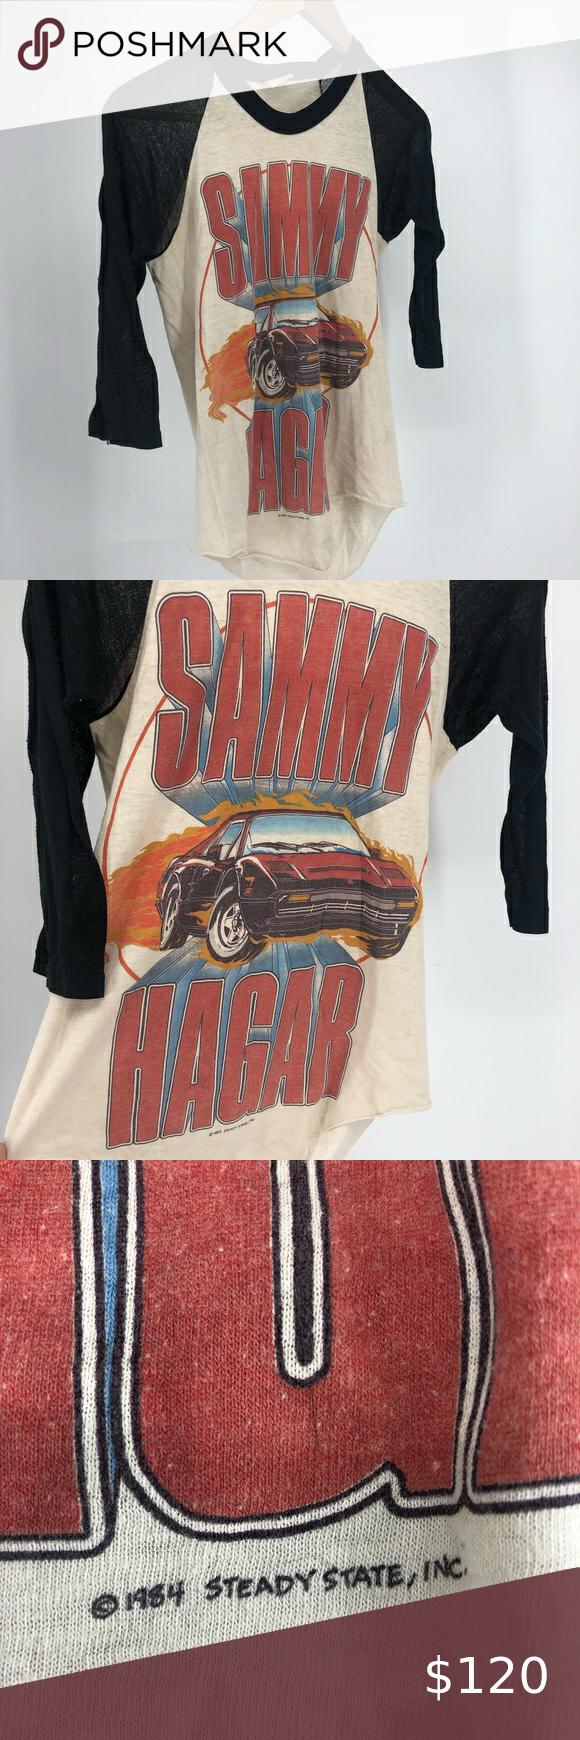 Vintage 1984 Sammy Hagar I Can Drive 55 Shirt S In 2020 Vintage Band T Shirts Concert Shirts Vintage Shirts